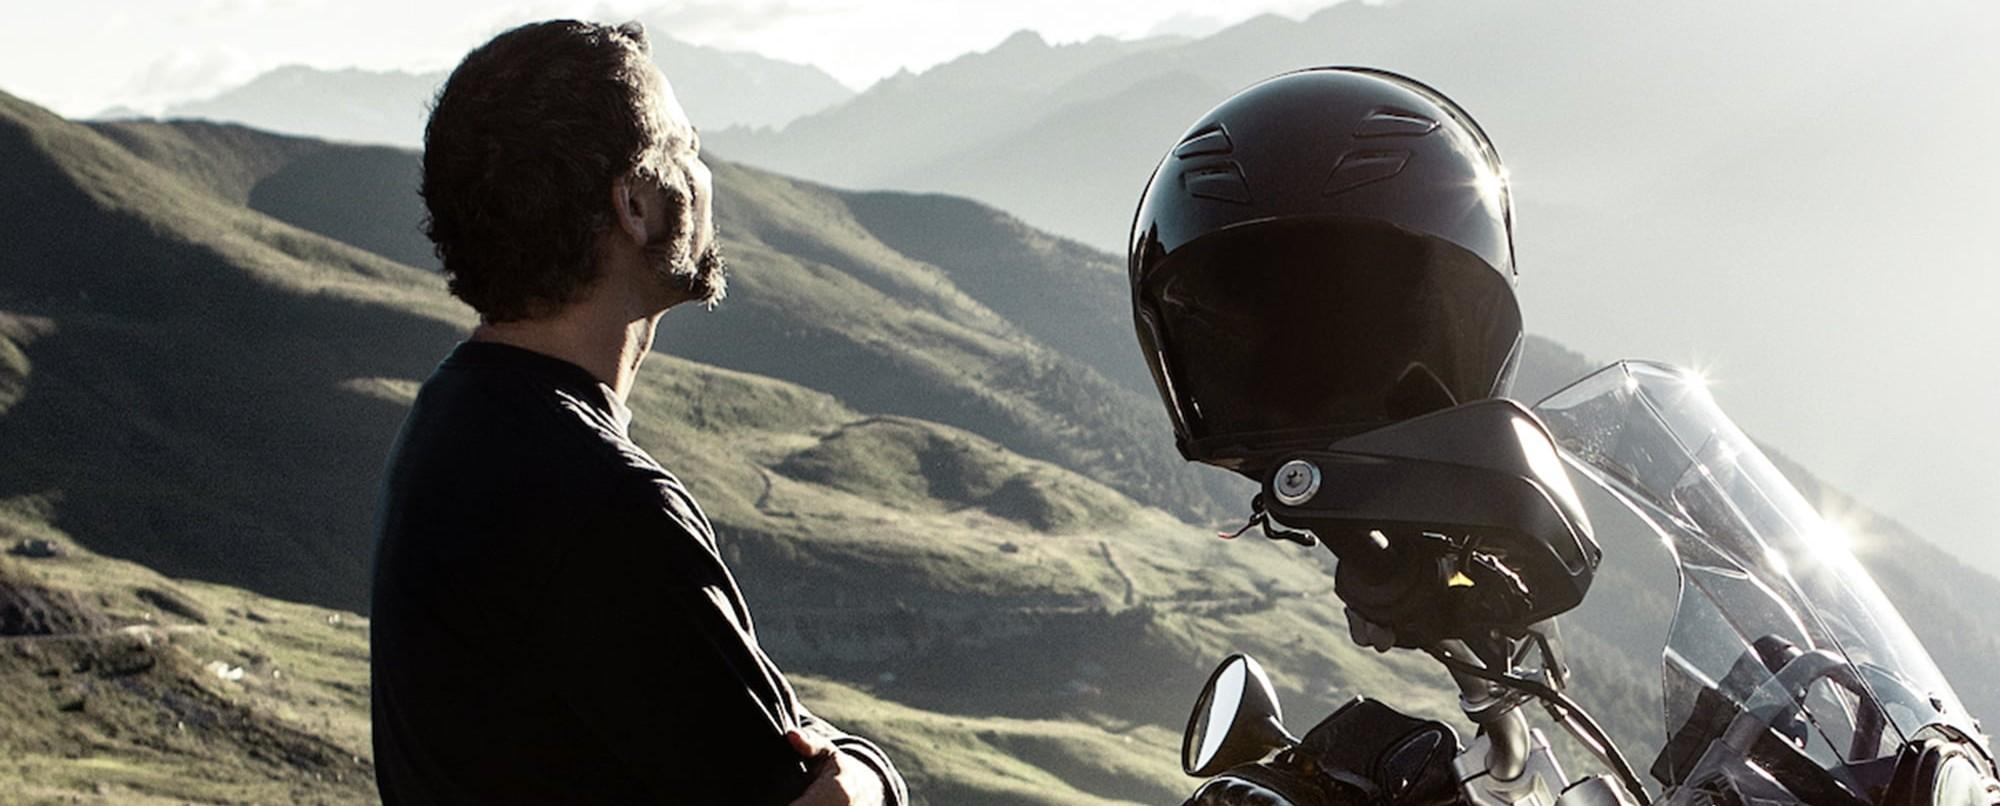 Sachs Motorrad